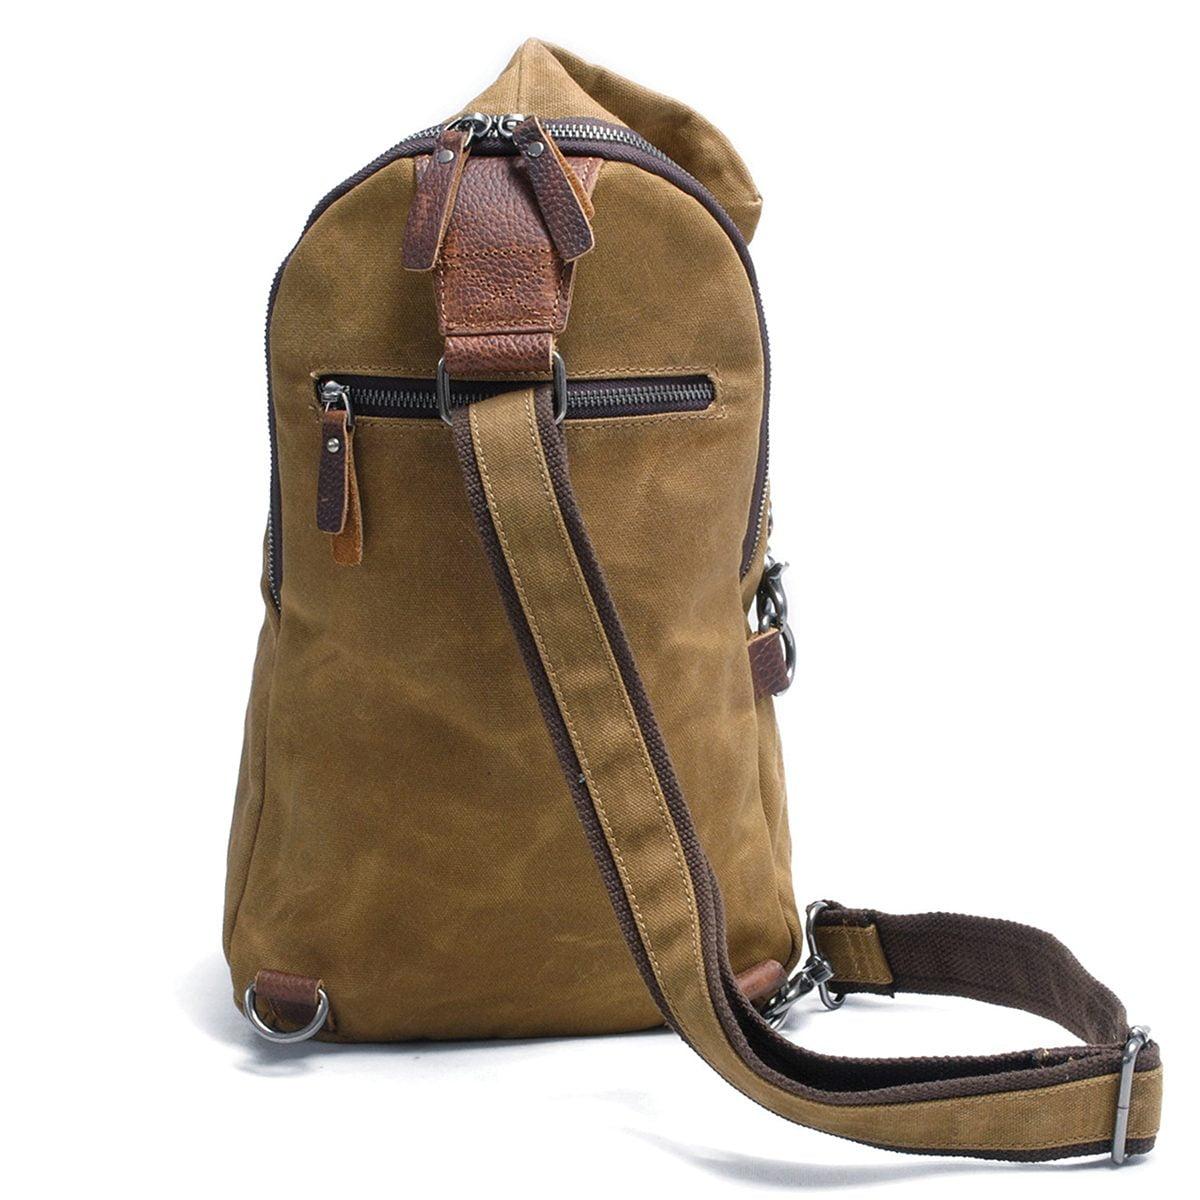 Túi đeo chéo Vintage vải canvas sáp dầu, da bò sáp – MOGOLY